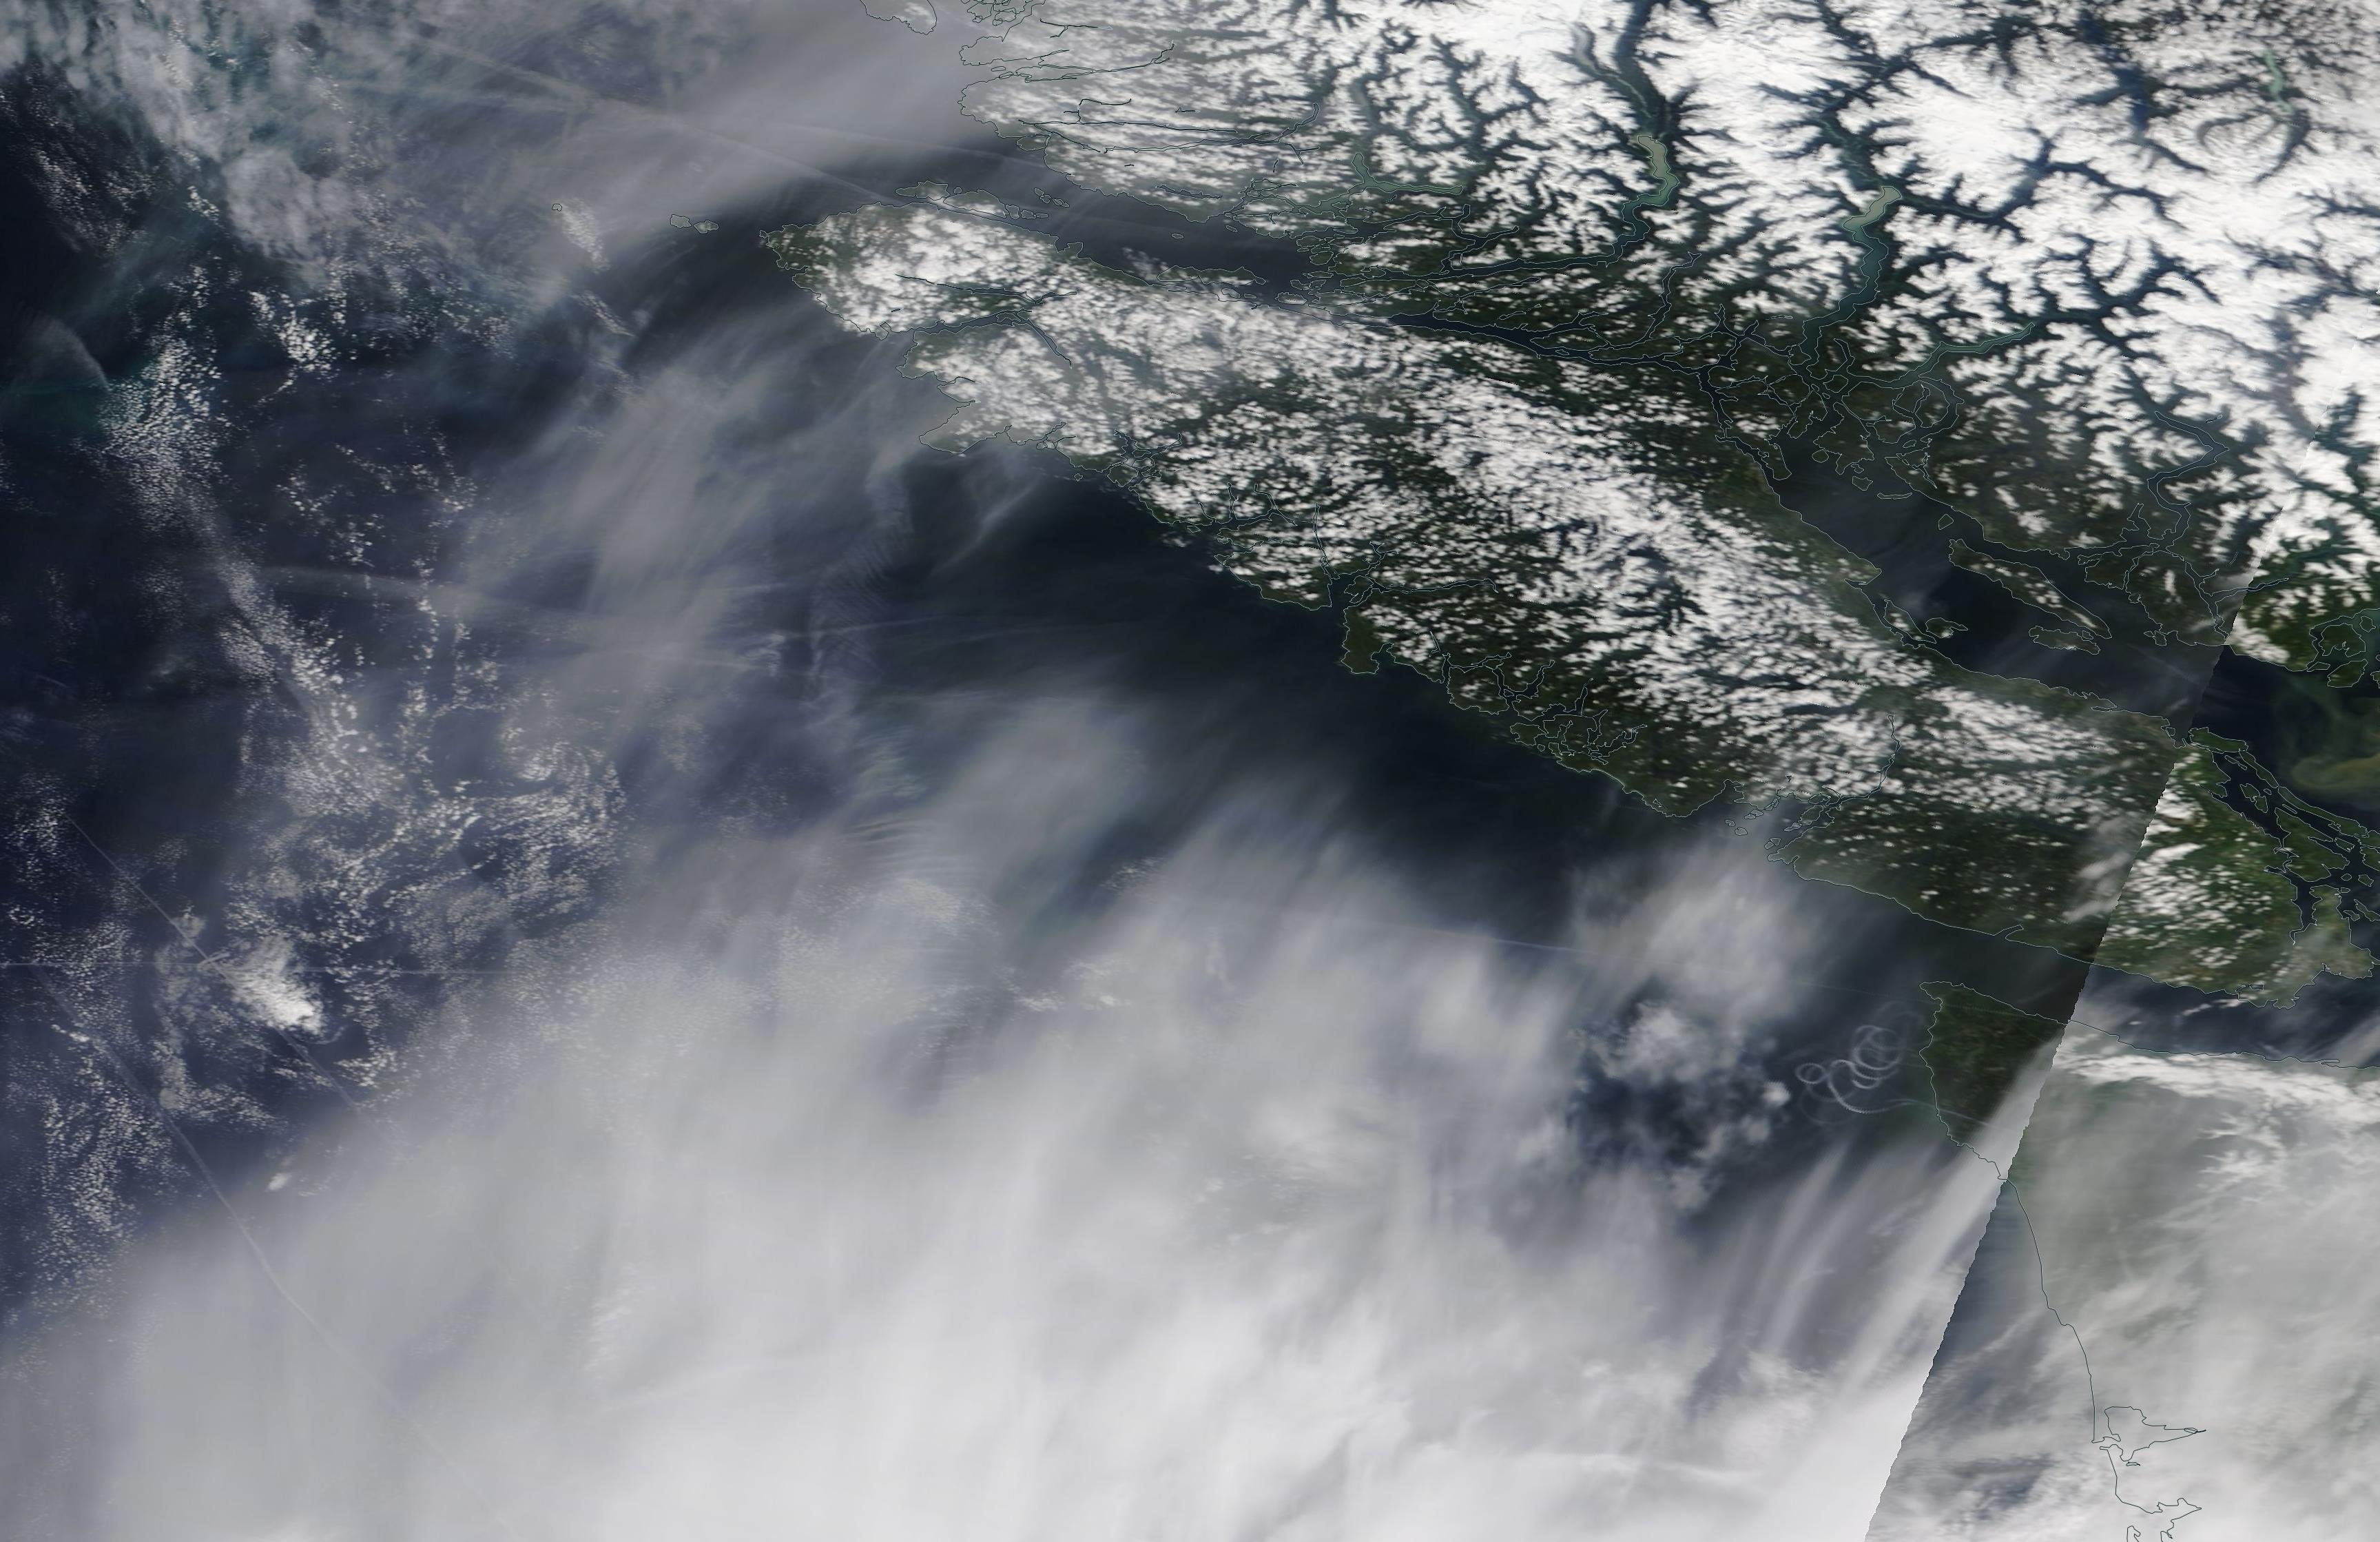 Vancouver chemtrail geoengineering 15 May 2019 ... https://go.nasa.gov/2JS8yrx